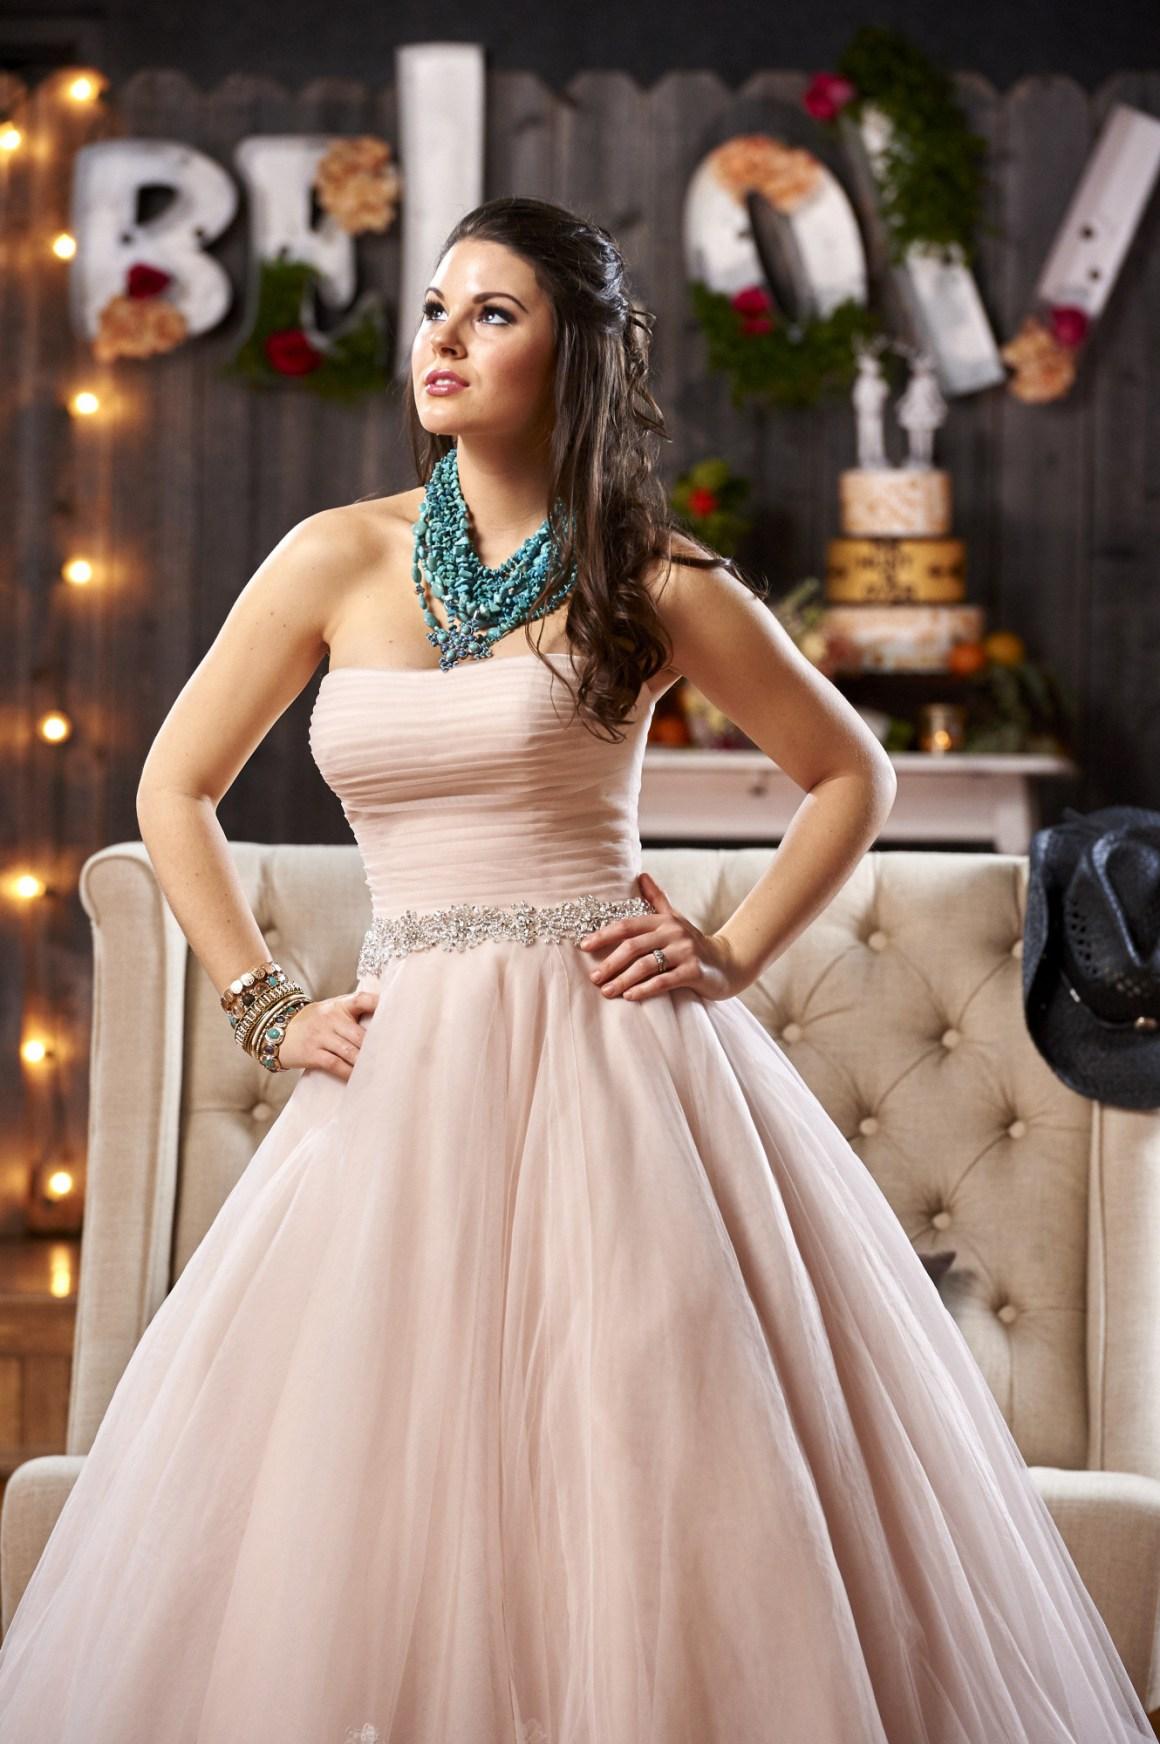 Blush Wedding Dress - Bliss Bridal - Rustic Wedding - BeLoved High Fashion Country Wedding - Styled Shoot - Terrace at Salado - Austin Wedding Photography